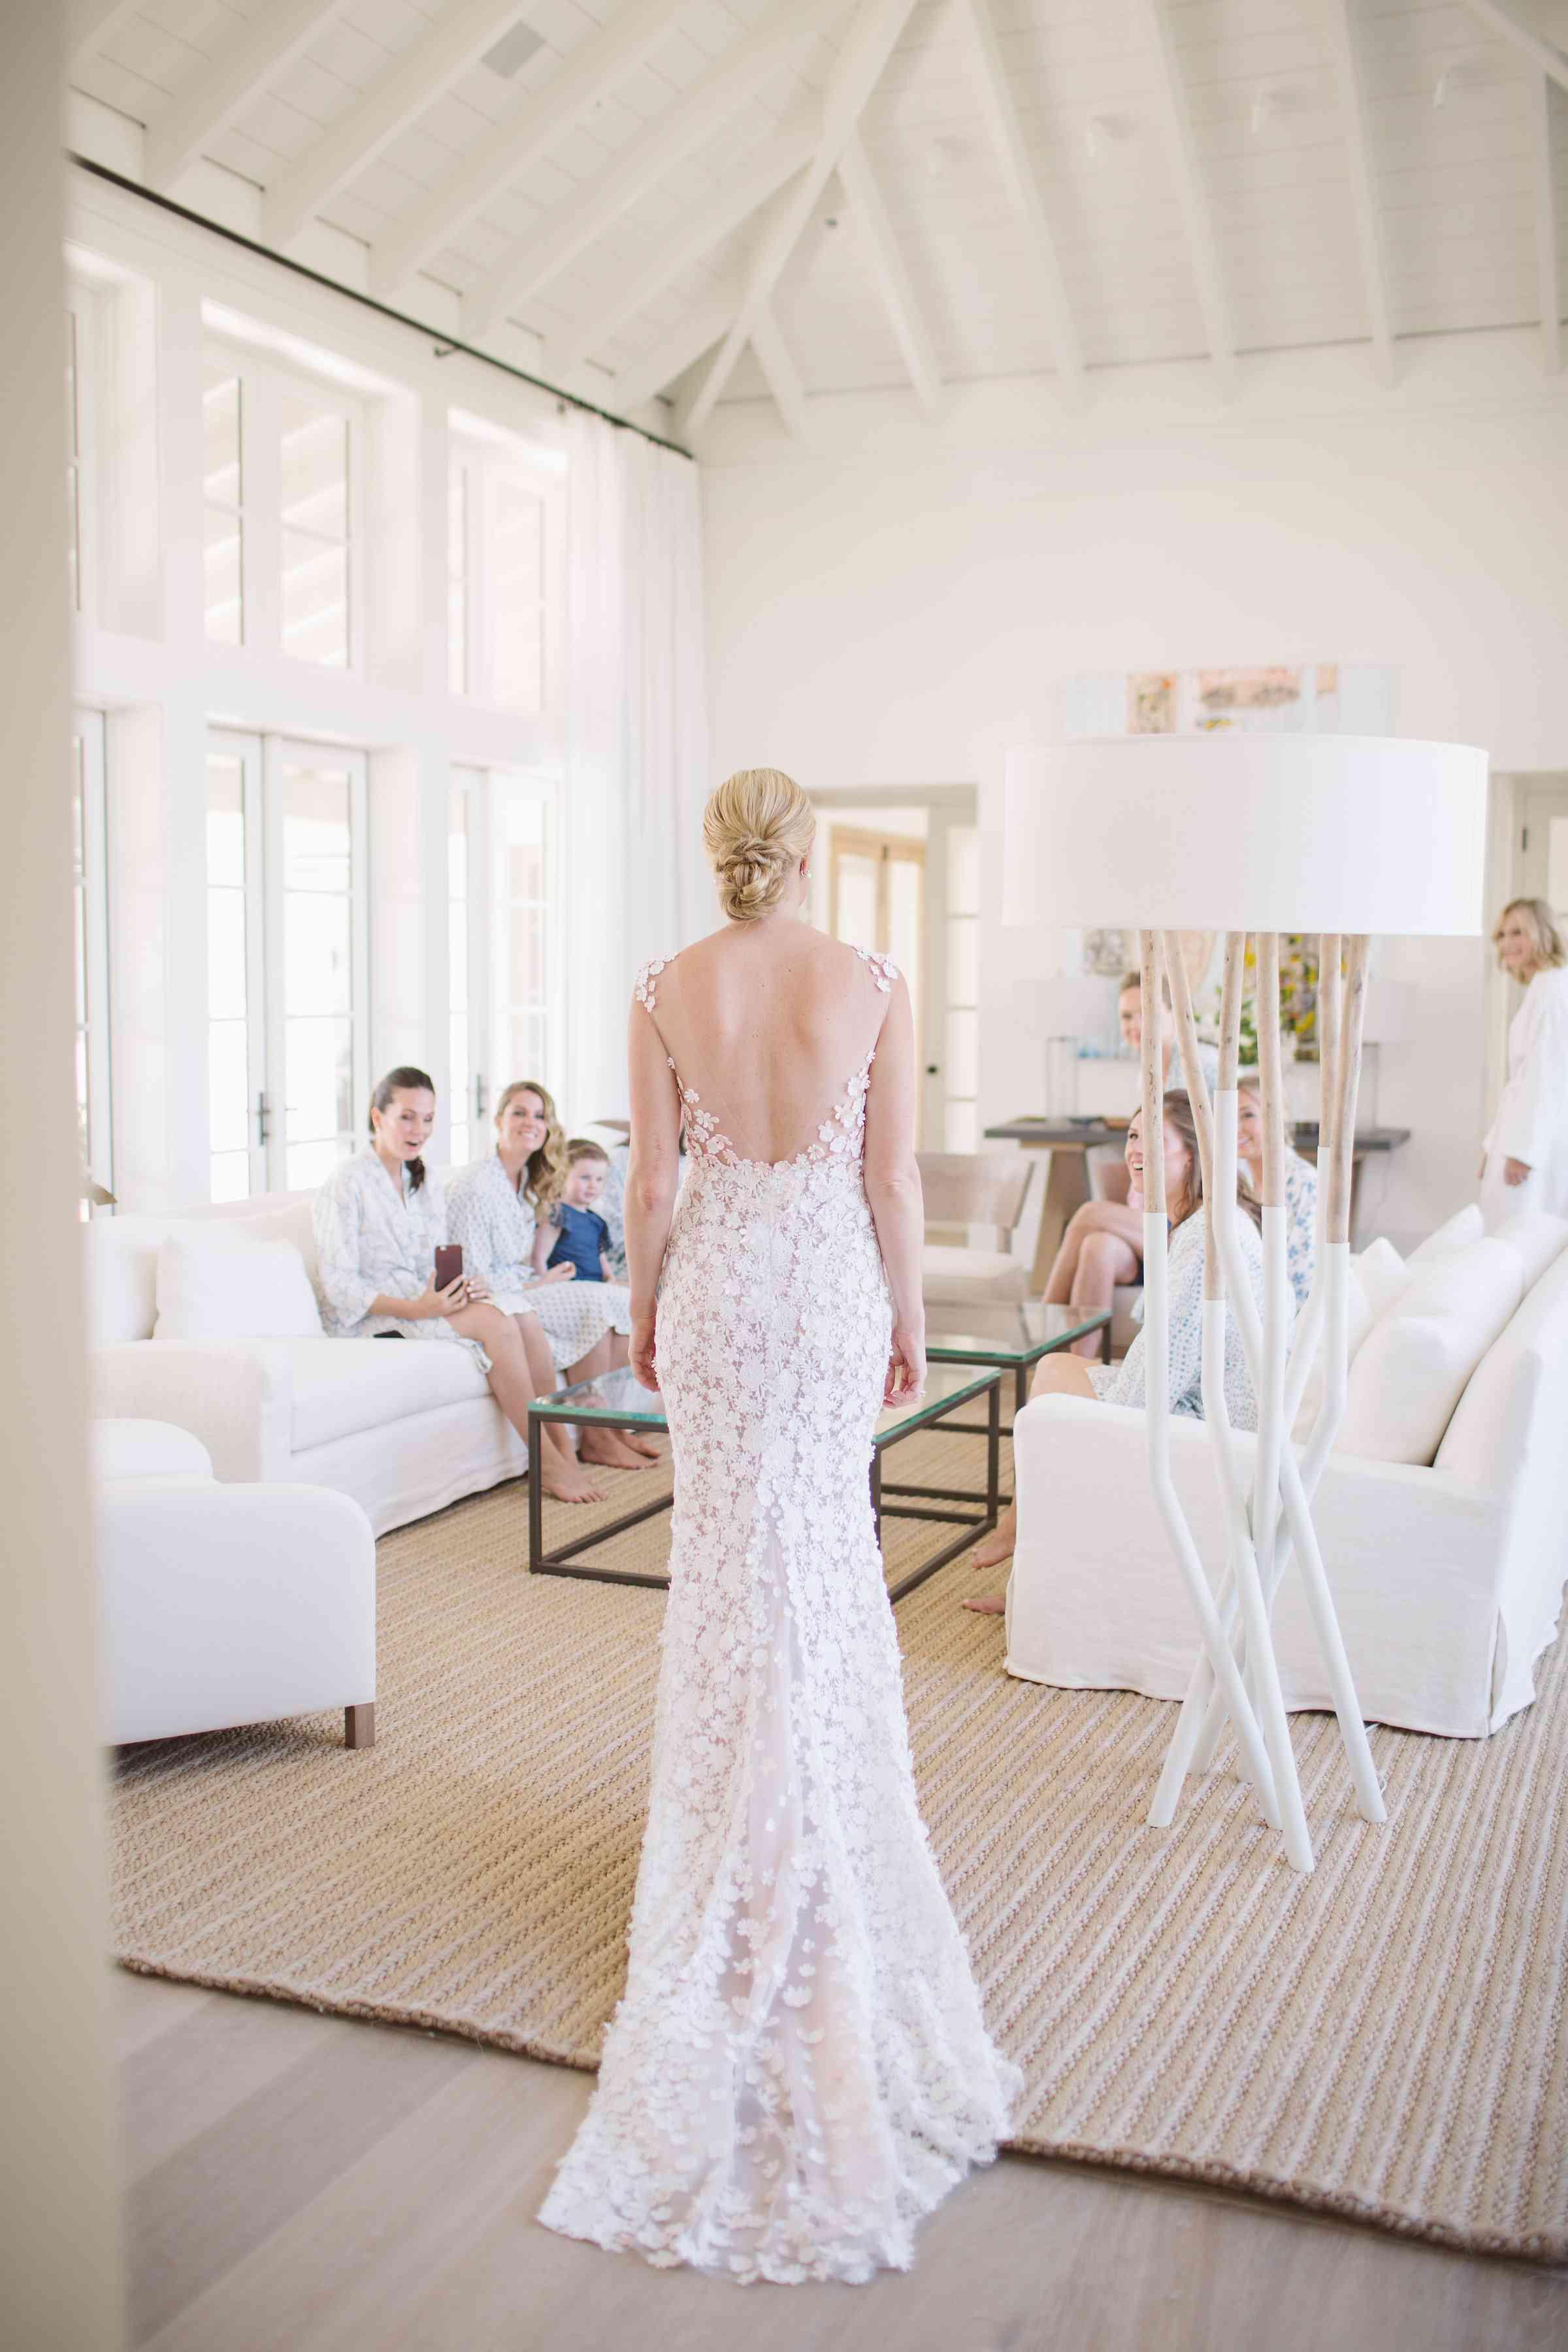 <p>bride showing dress to bridesmaids</p><br><br>